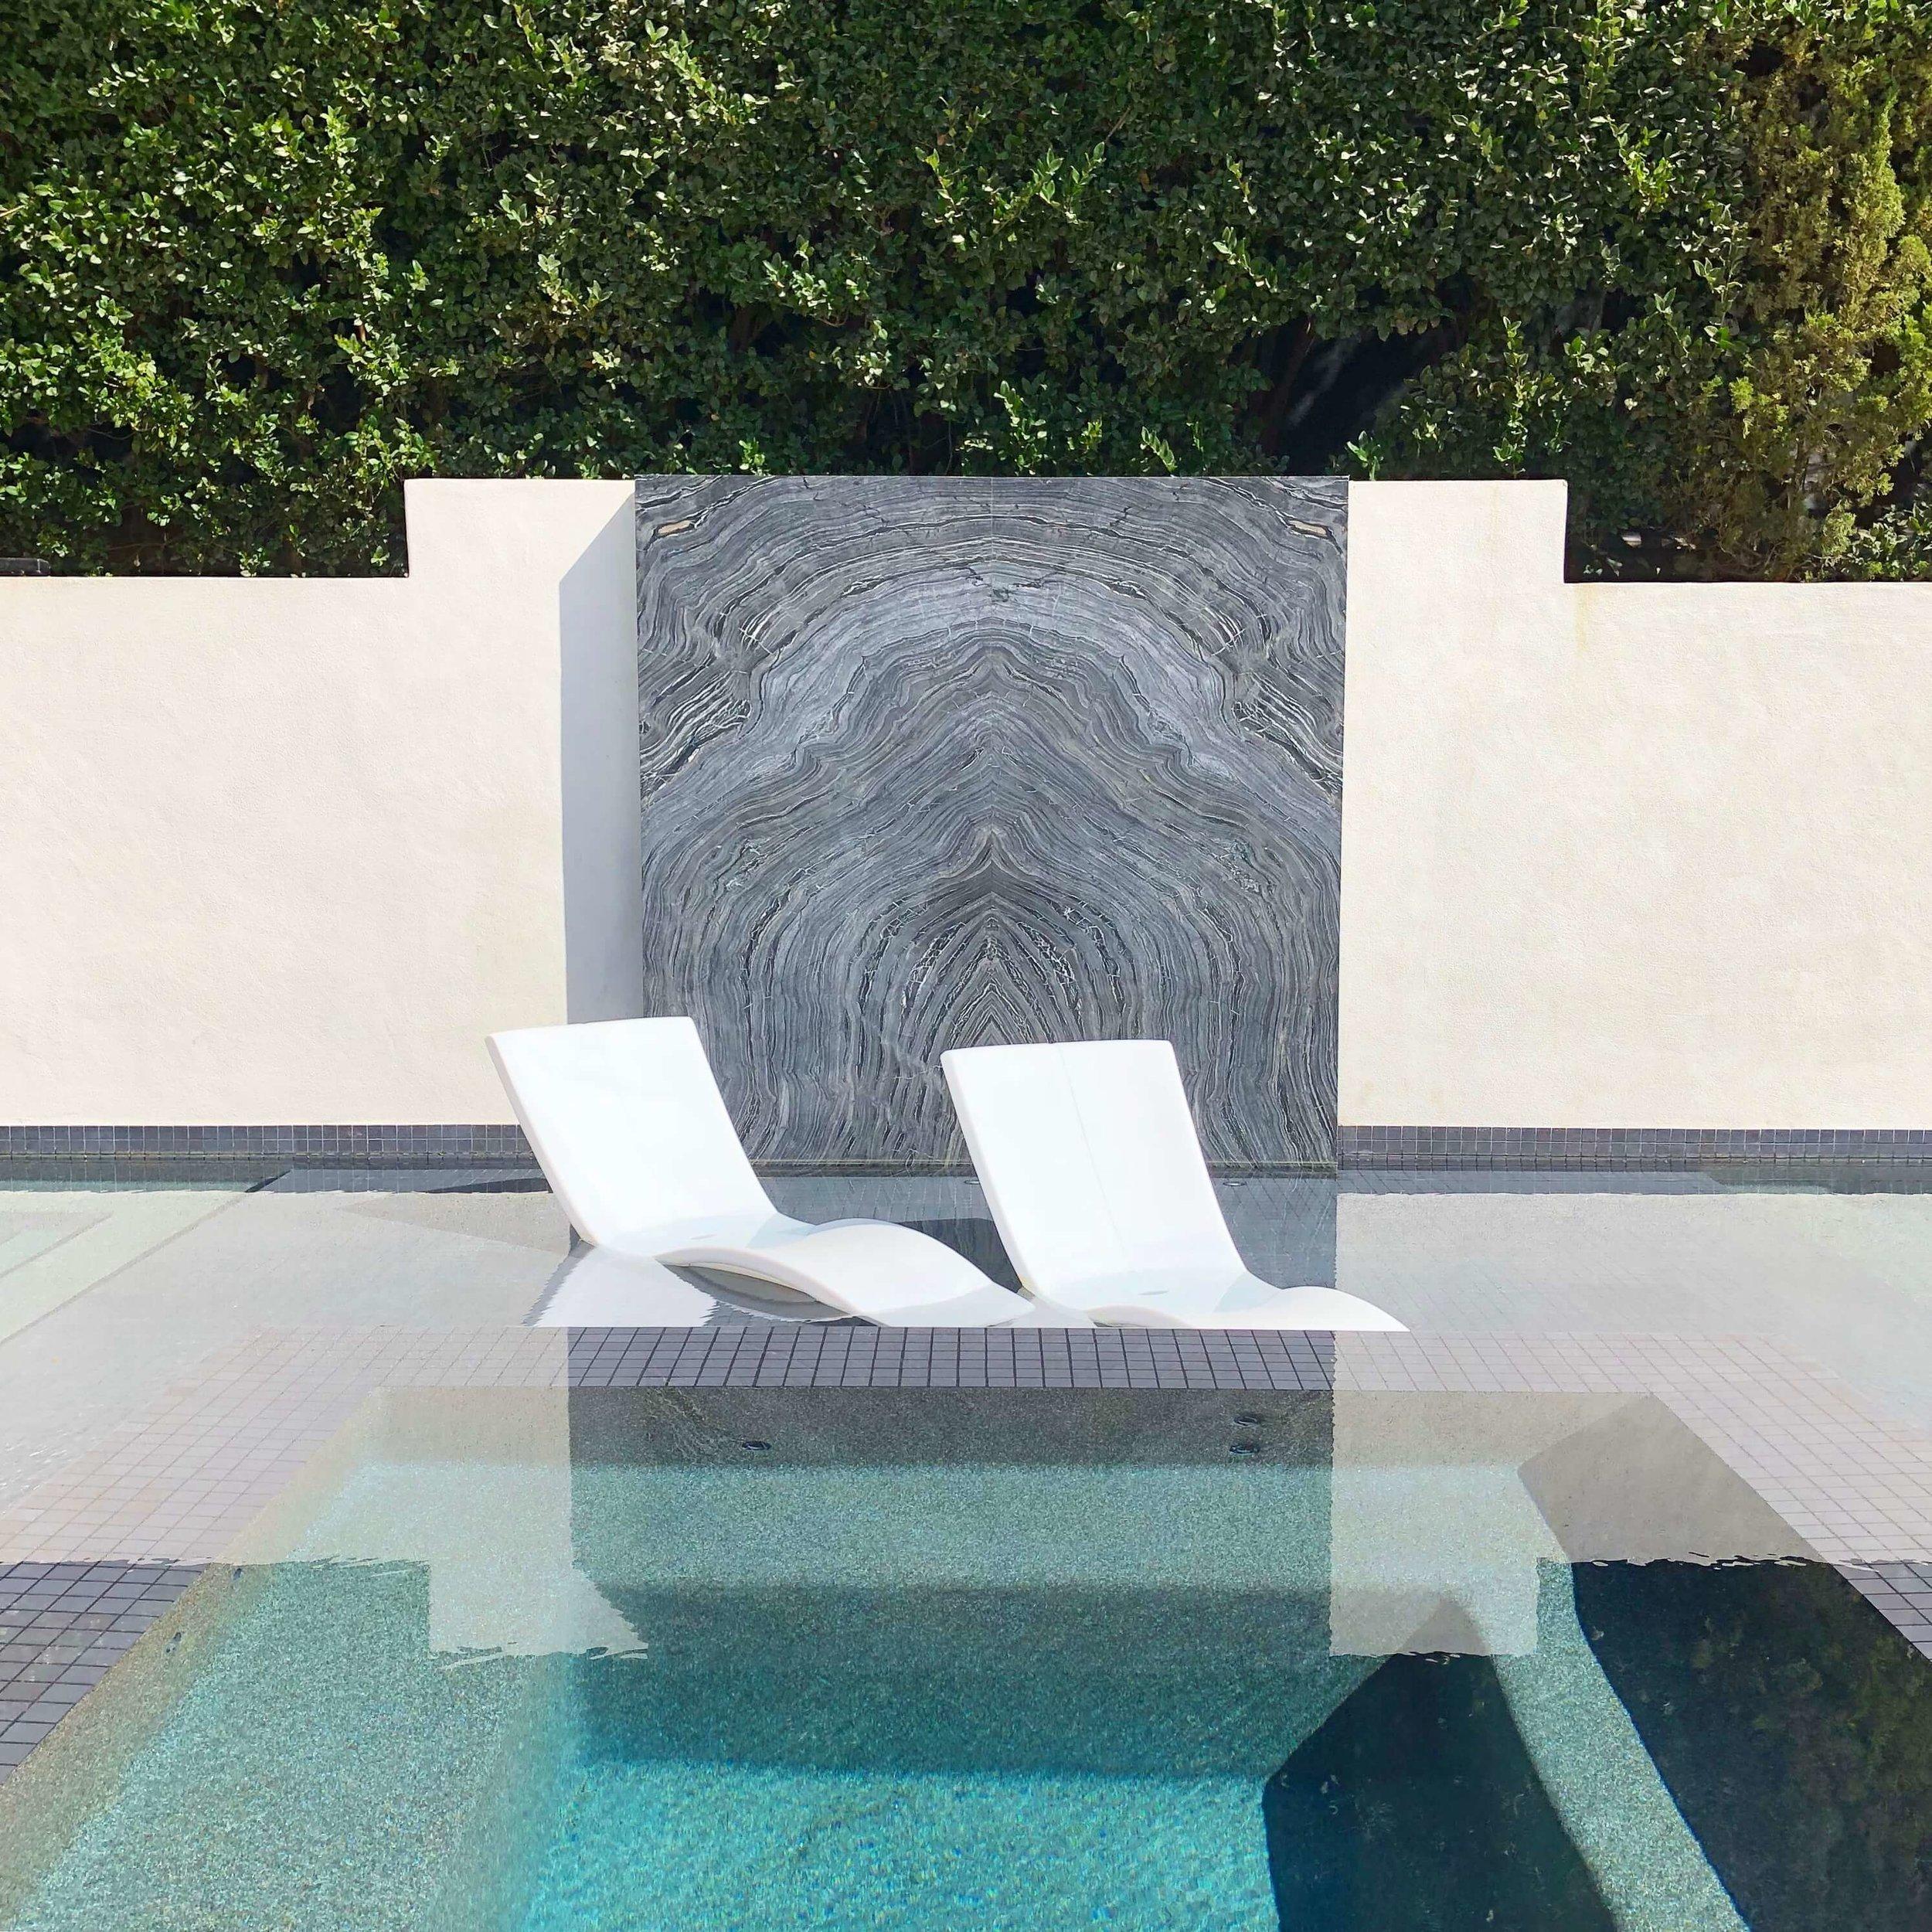 Contemporary swimming pool at the Pasadena Showcase House of Design 2018, Huntington Pools